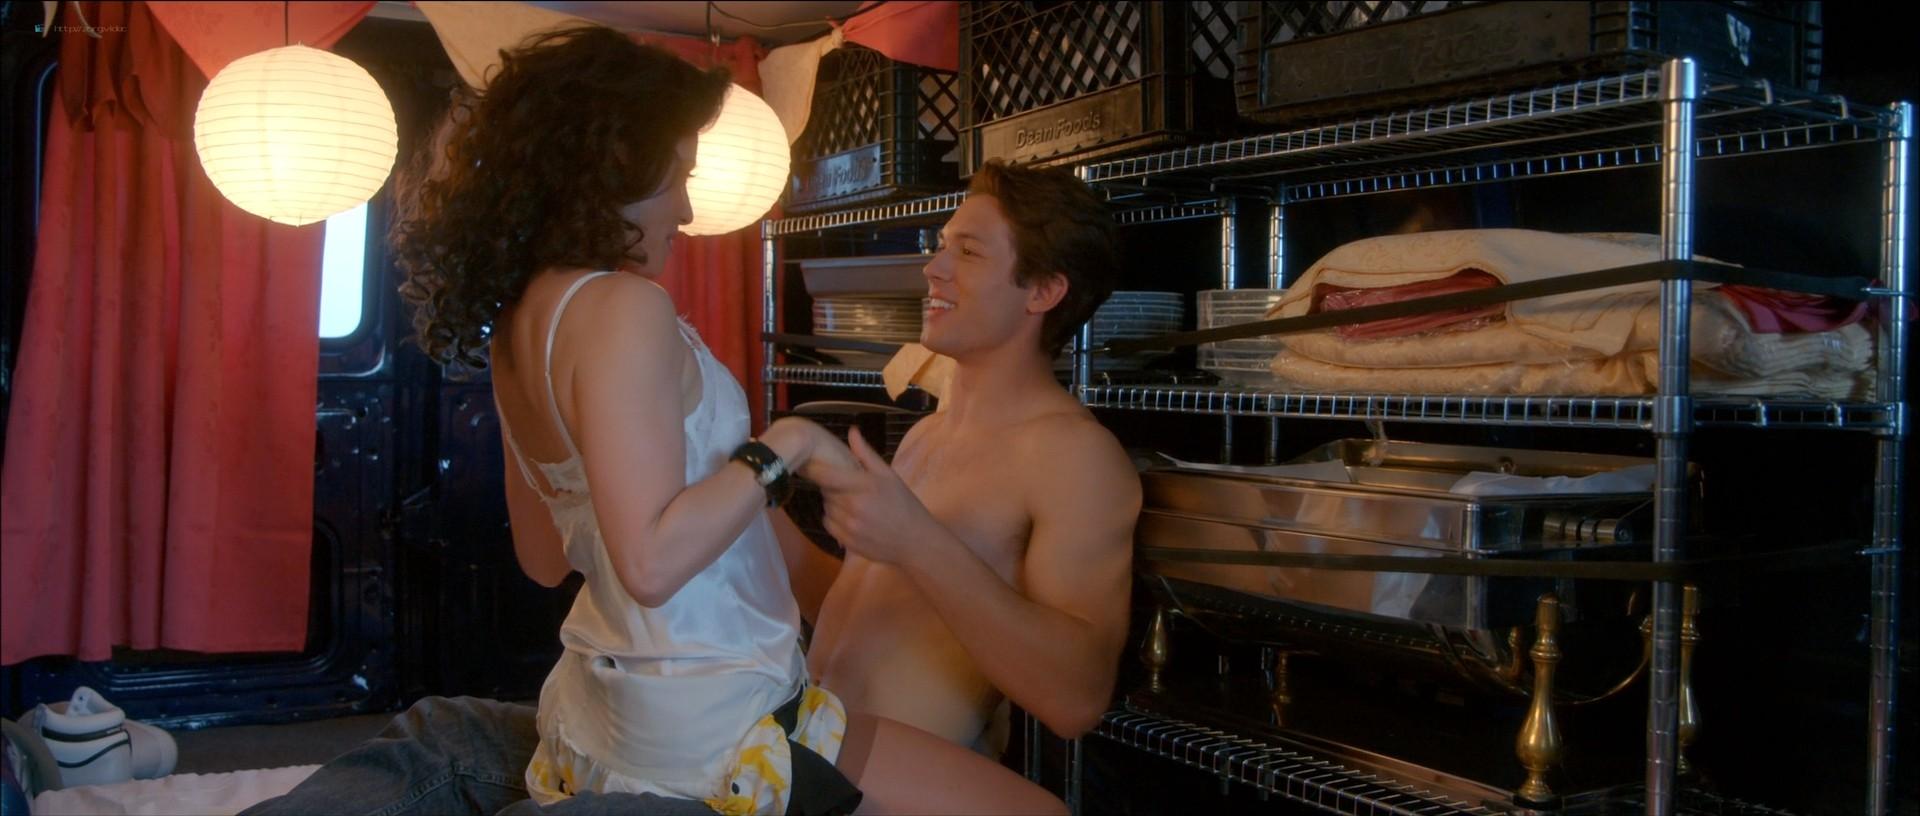 Alexandra Daddario sexy Lucy Liu hot and some sex - Why Women Kill (2019) s1e3 HD 1080p Web (12)